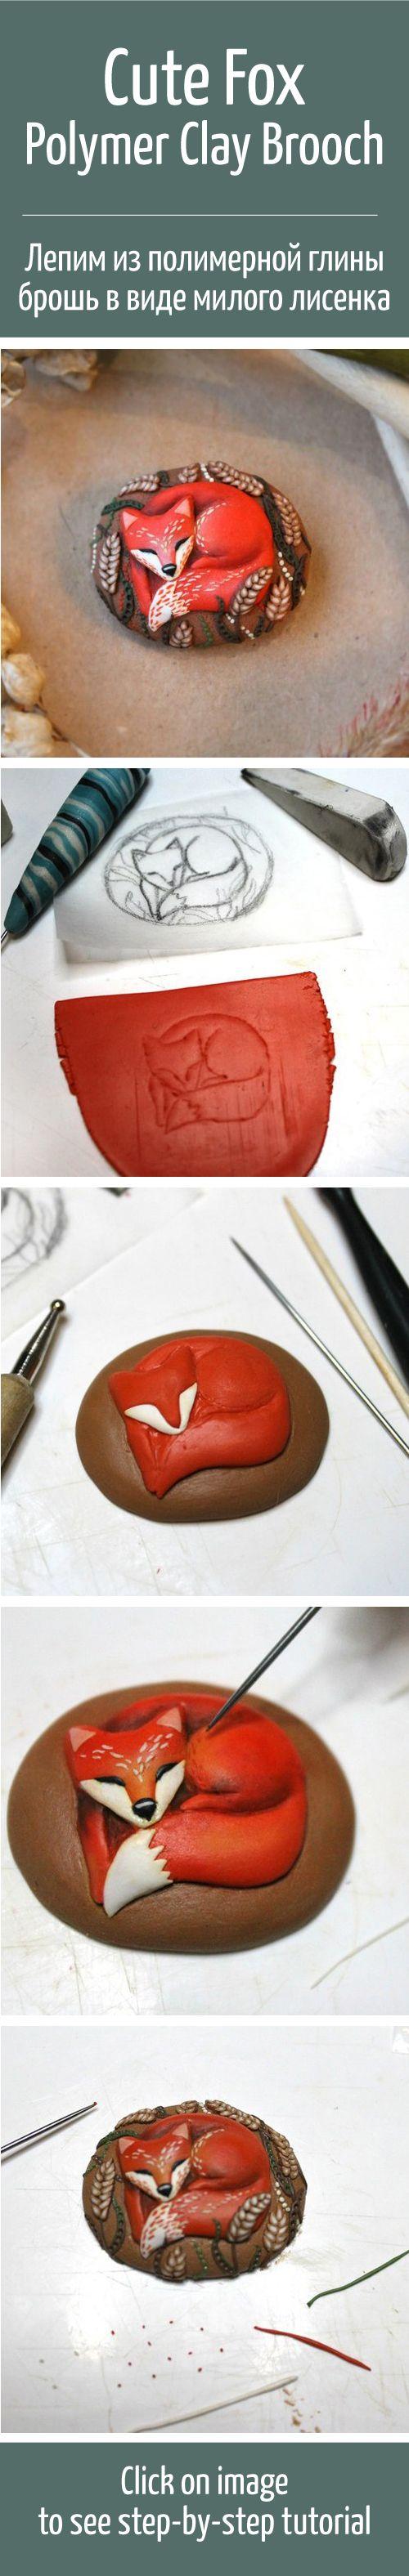 FREE POLYMER CLAY TUTORIAL: Cute polymer clay brooch Fox tutorial / Лепим из полимерной глины брошь в виде милого лисенка